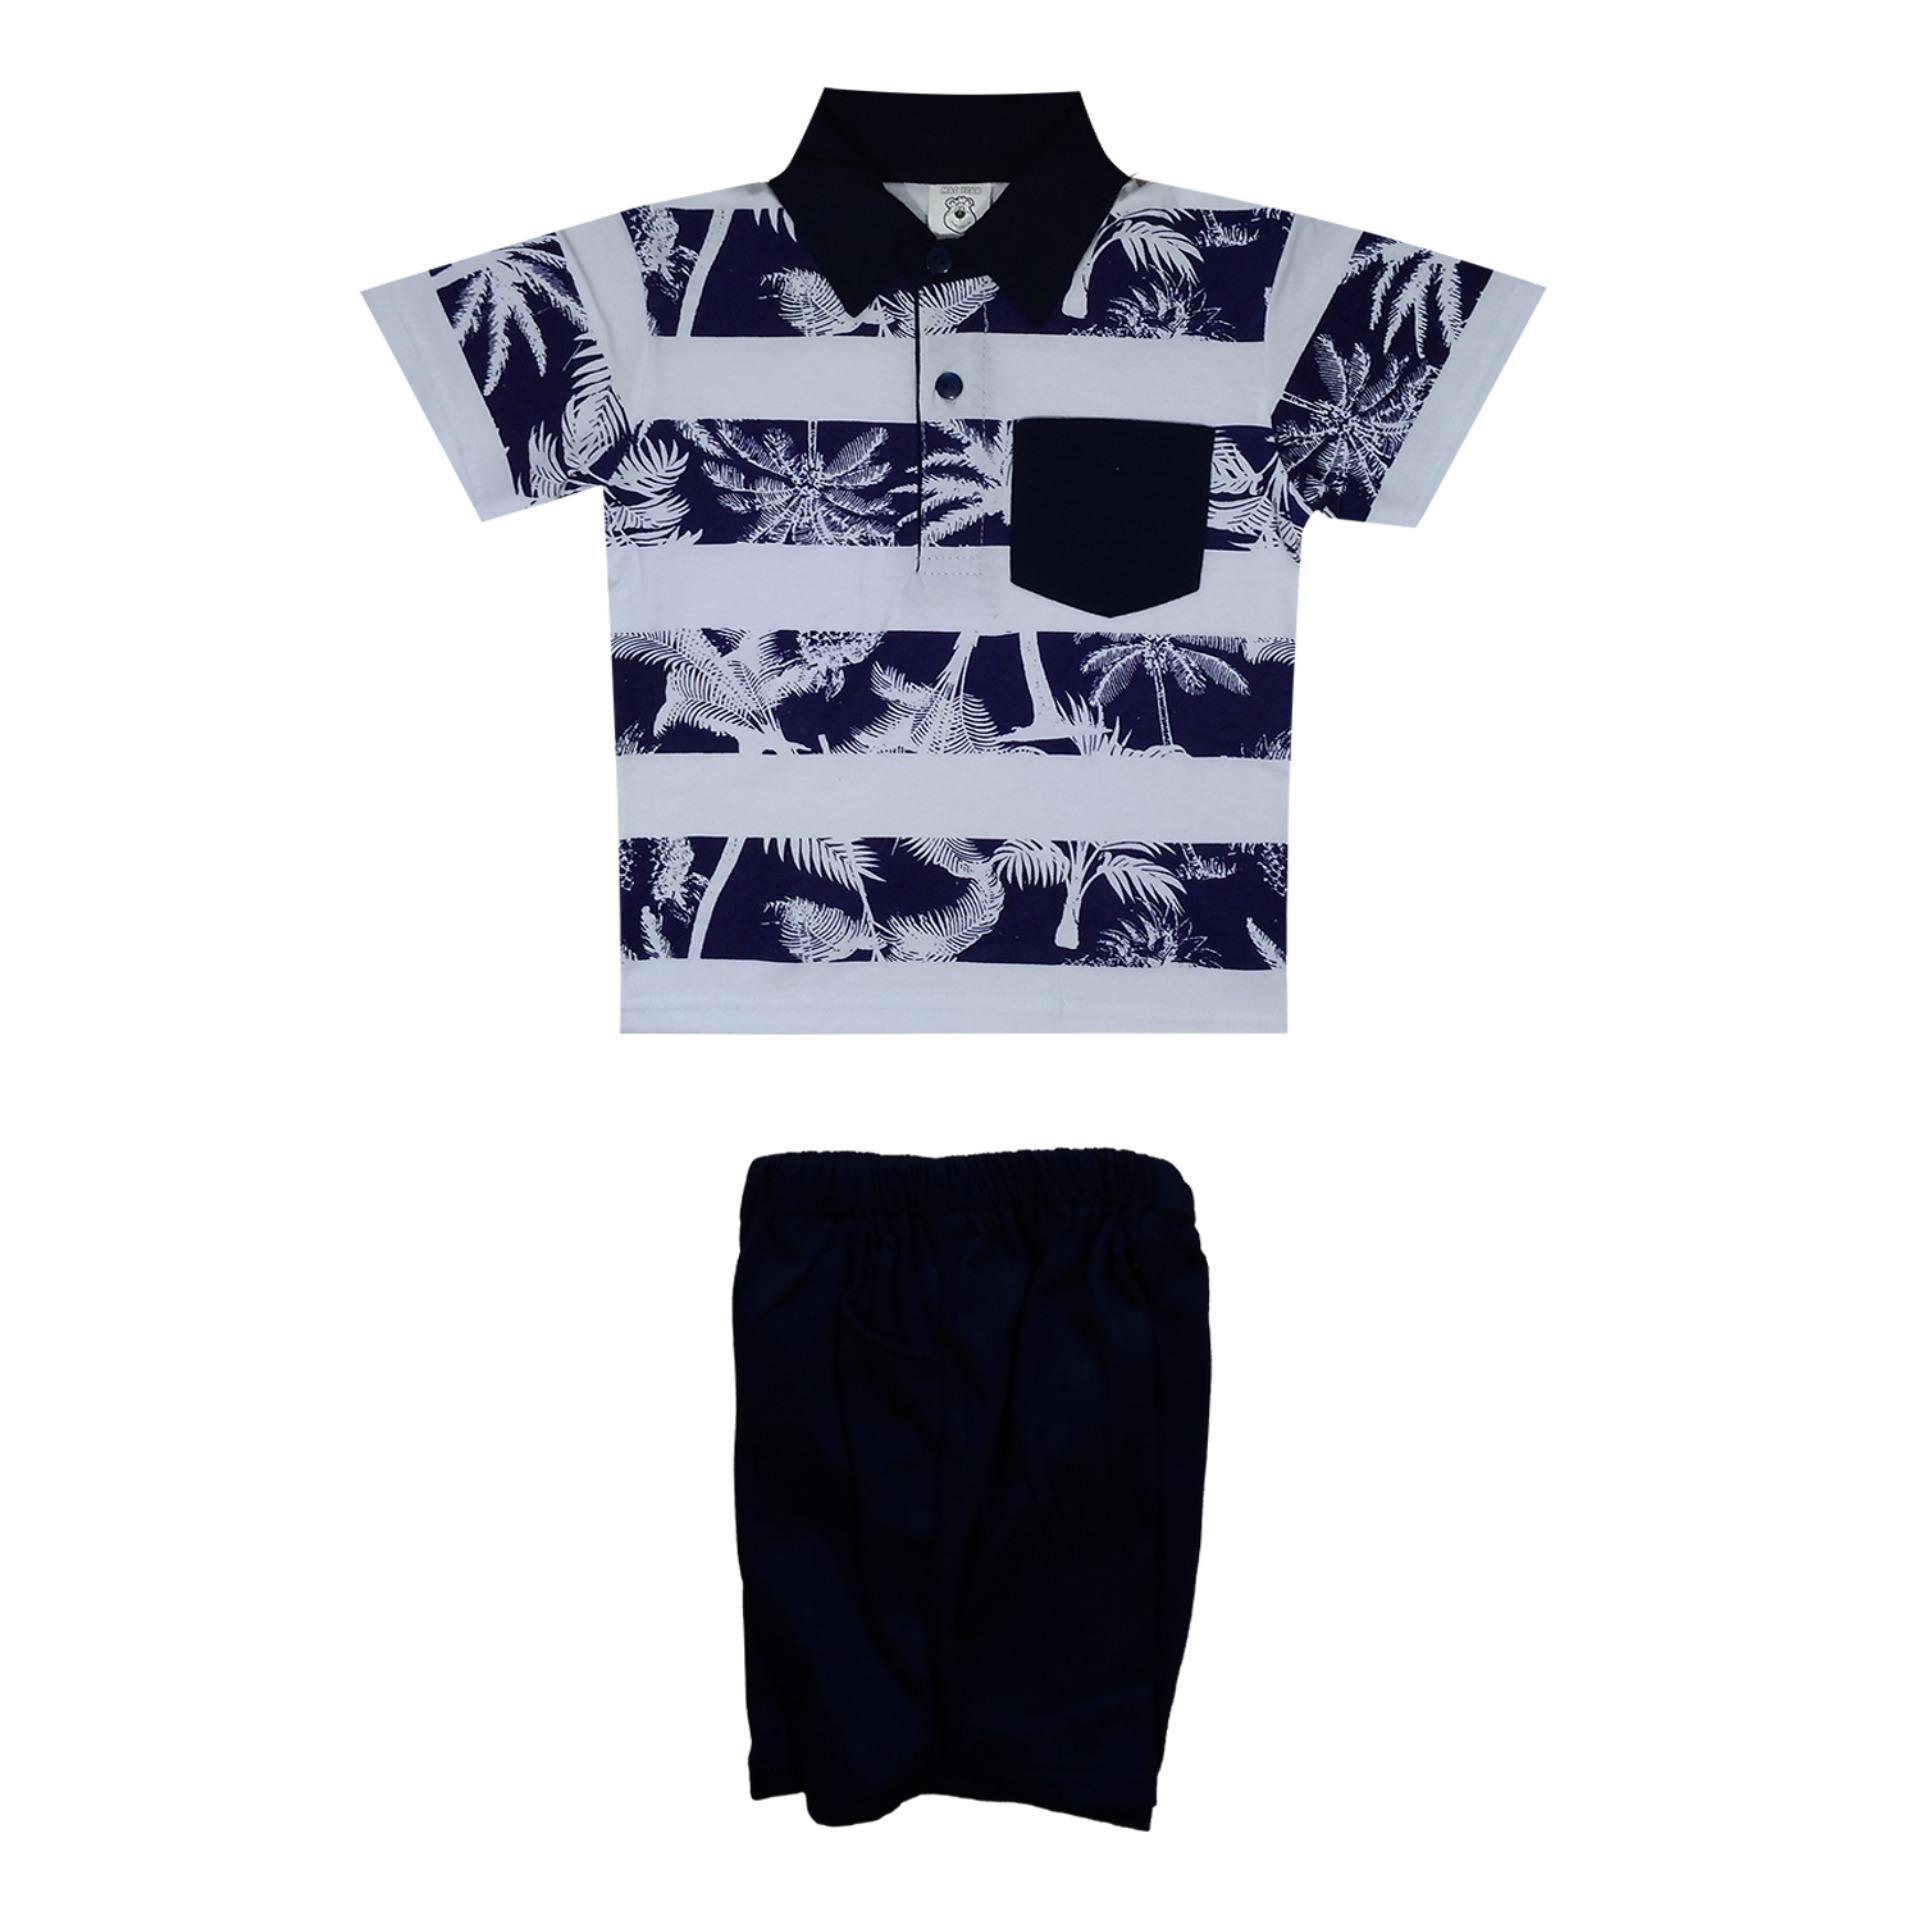 Macbear Baju Polo Anak M For White Stripes On Yellow Size 5 De5 1805 Junior Kemeja Lengan Panjang 3 Stars Blue 12 Biru Kids Setelan Palm Beach